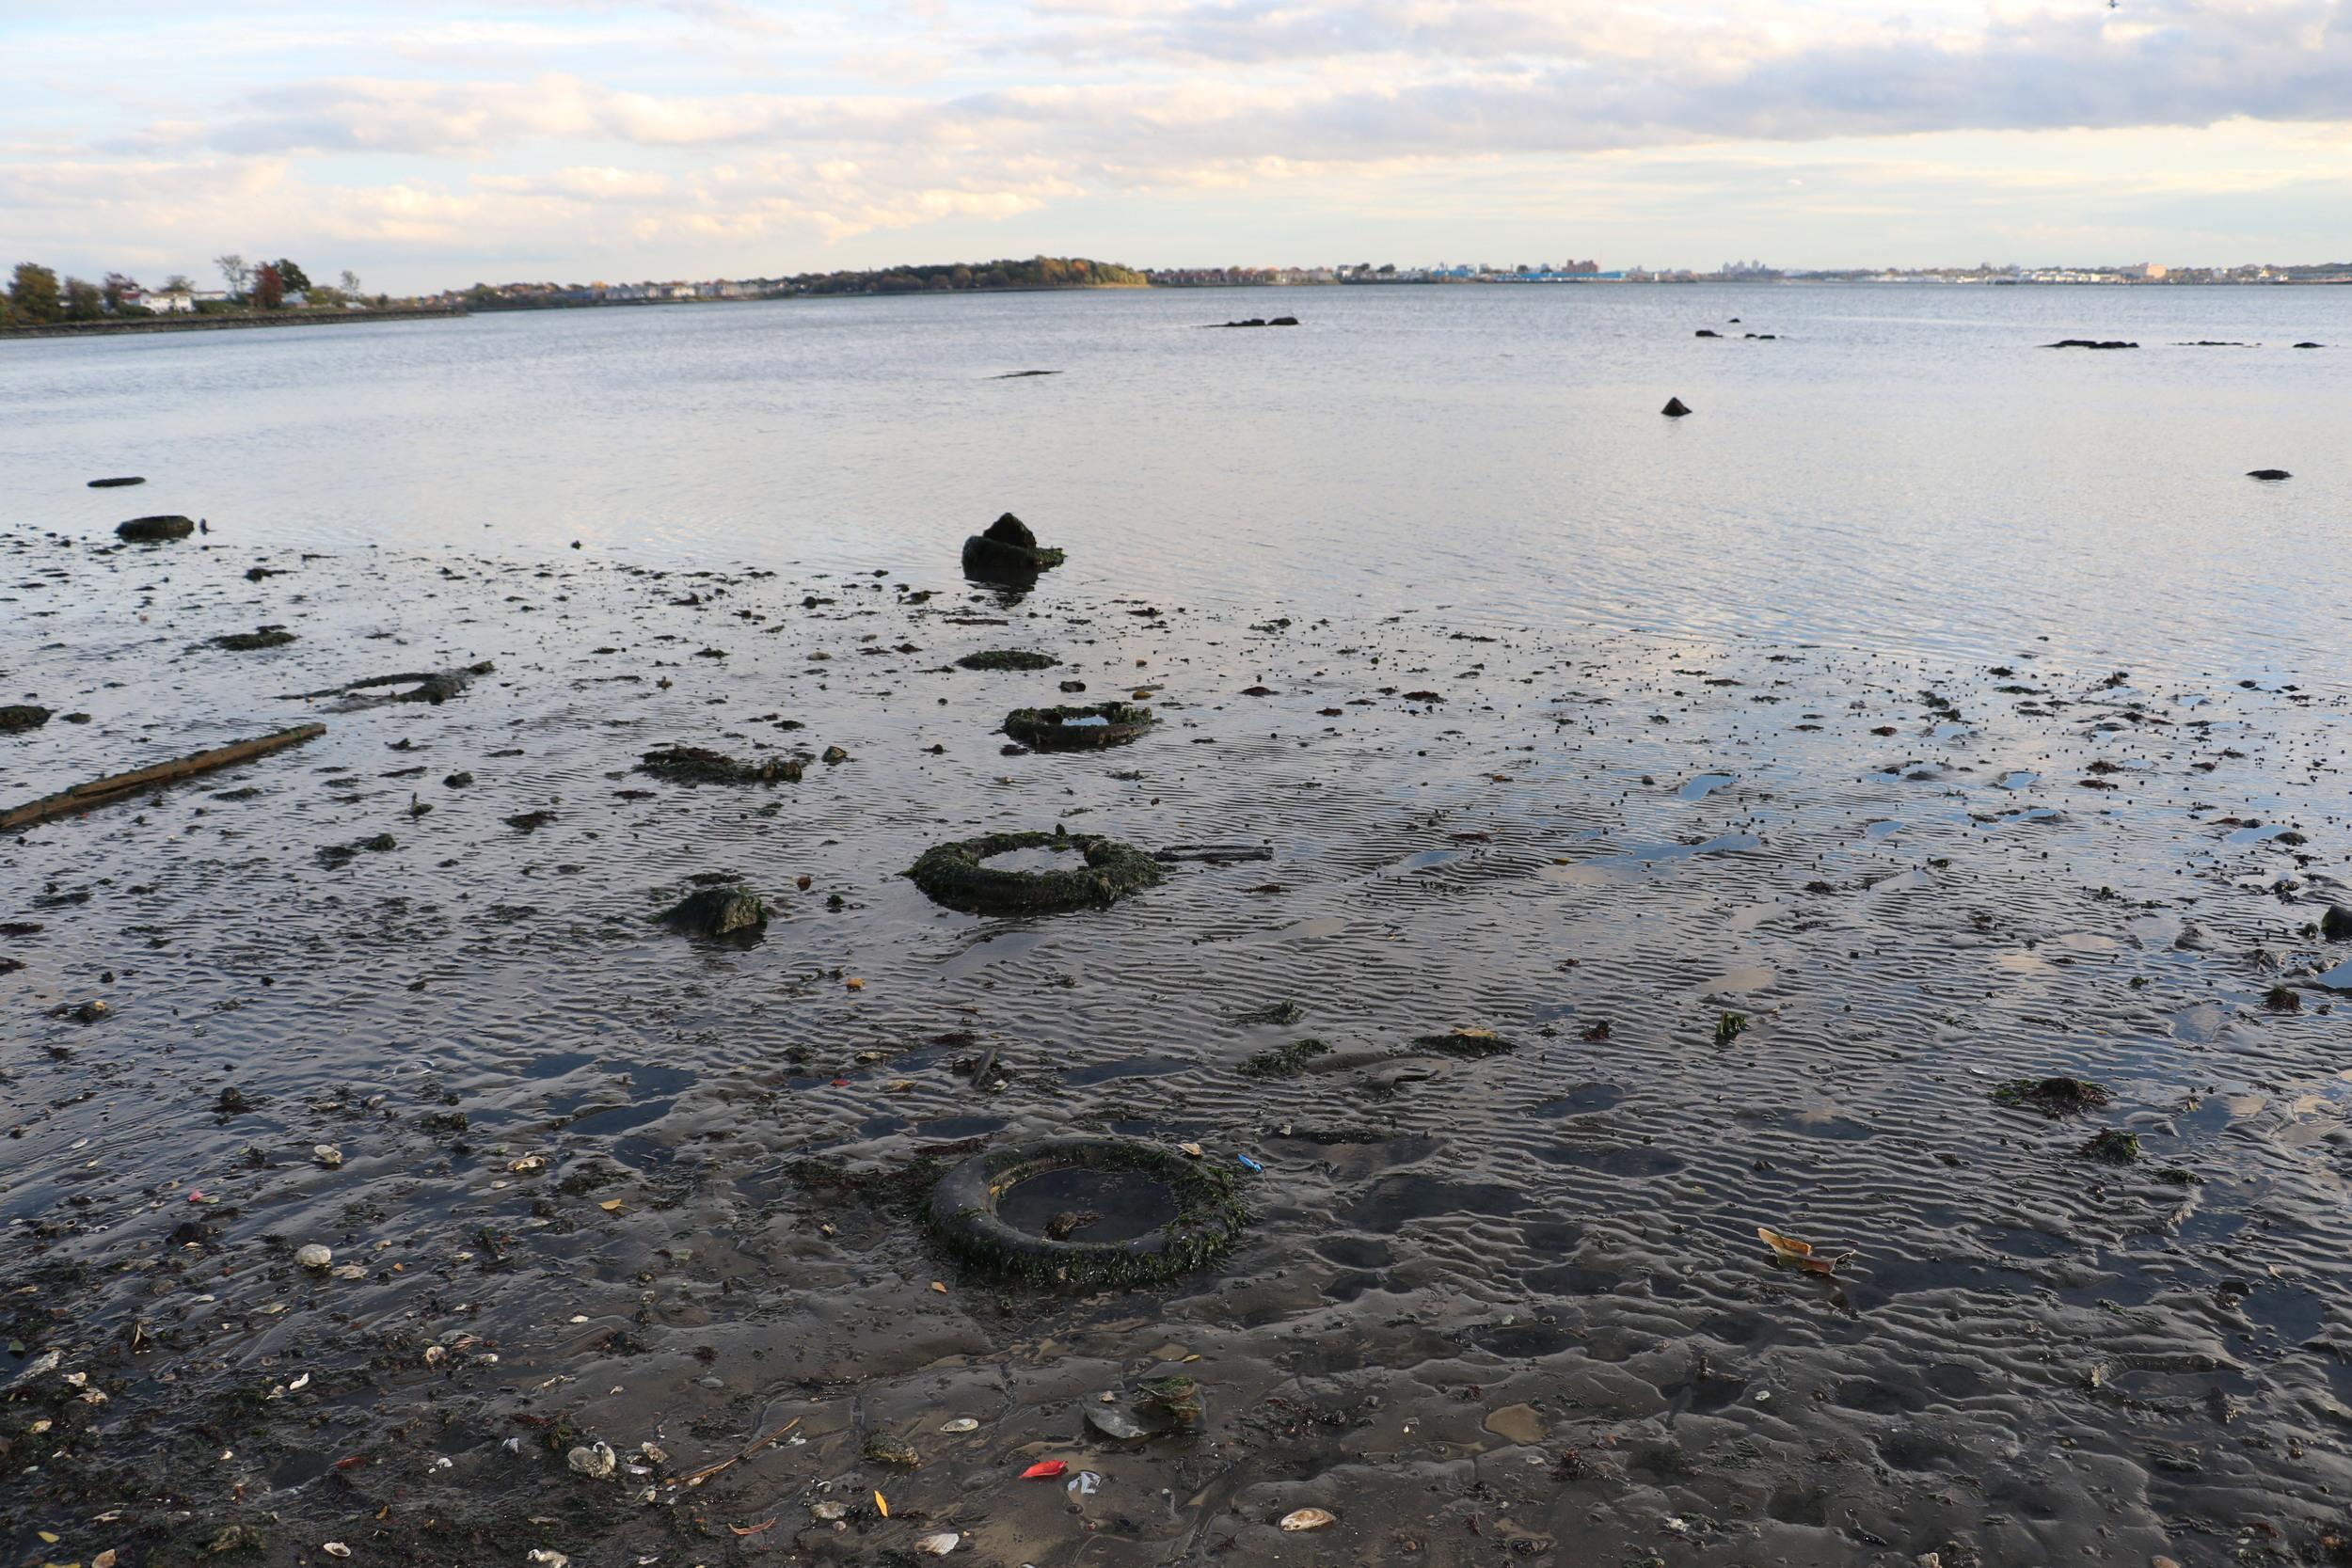 Tires at Low Tide, Photo Credit: Liz Summit, 2015